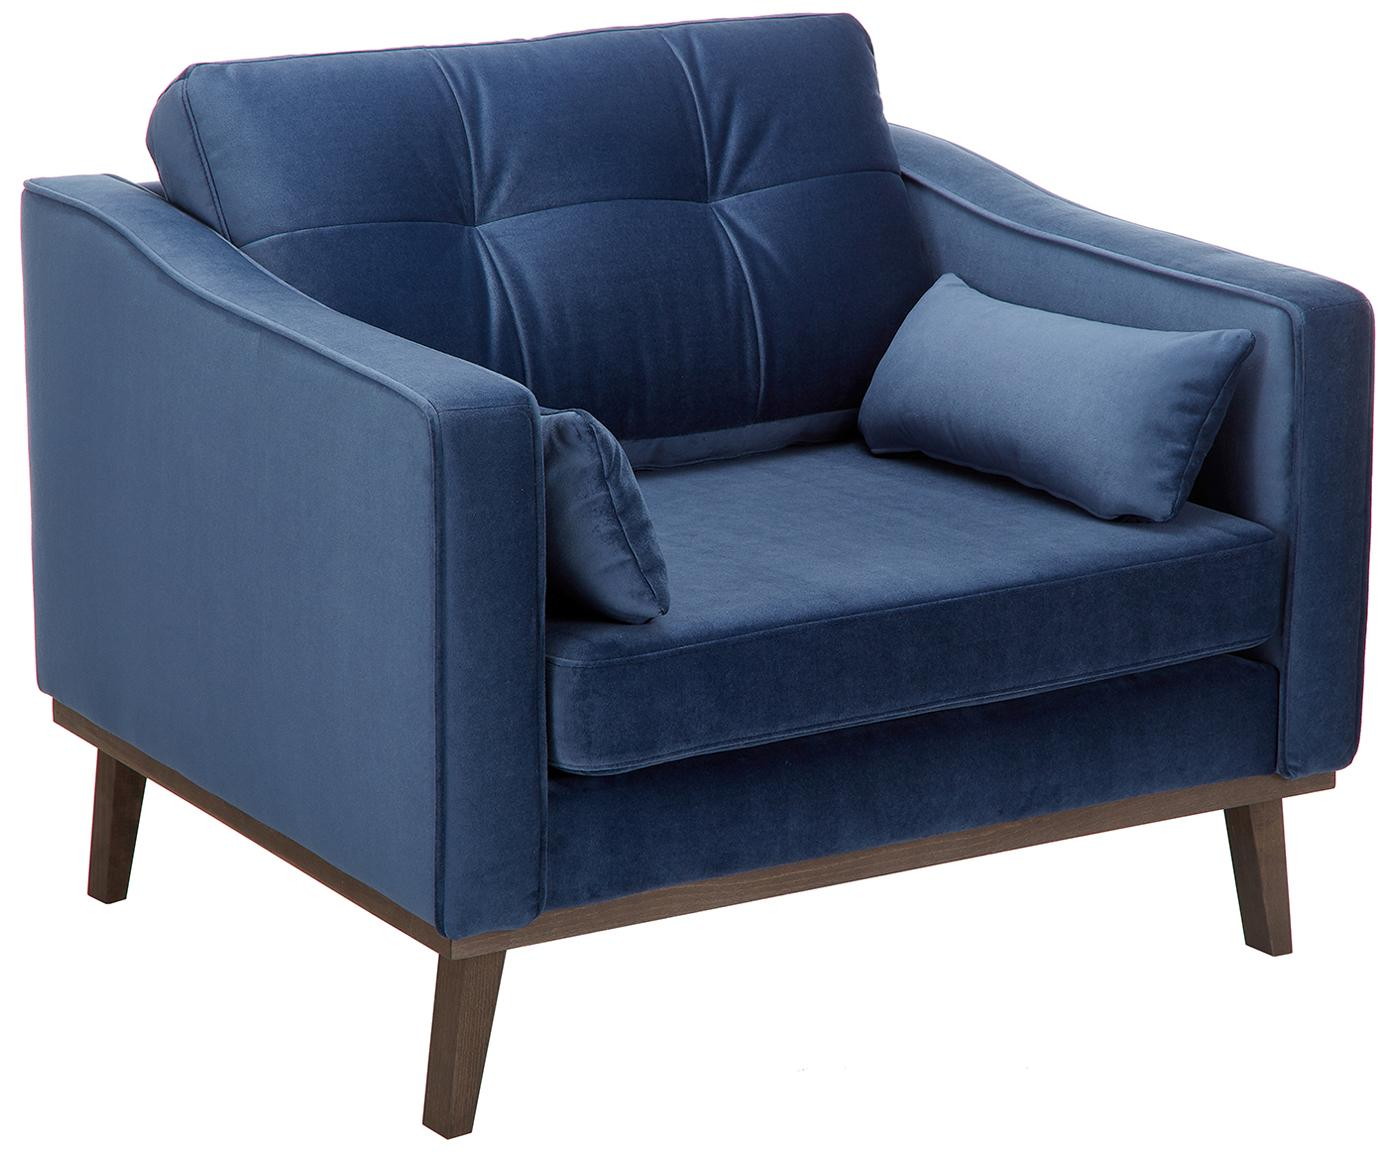 Klassischer Samt-Sessel Alva in Blau, Bezug: Samt (Hochwertiger Polyes, Gestell: Massives Kiefernholz, Samt Dunkelblau, B 102 x T 92 cm